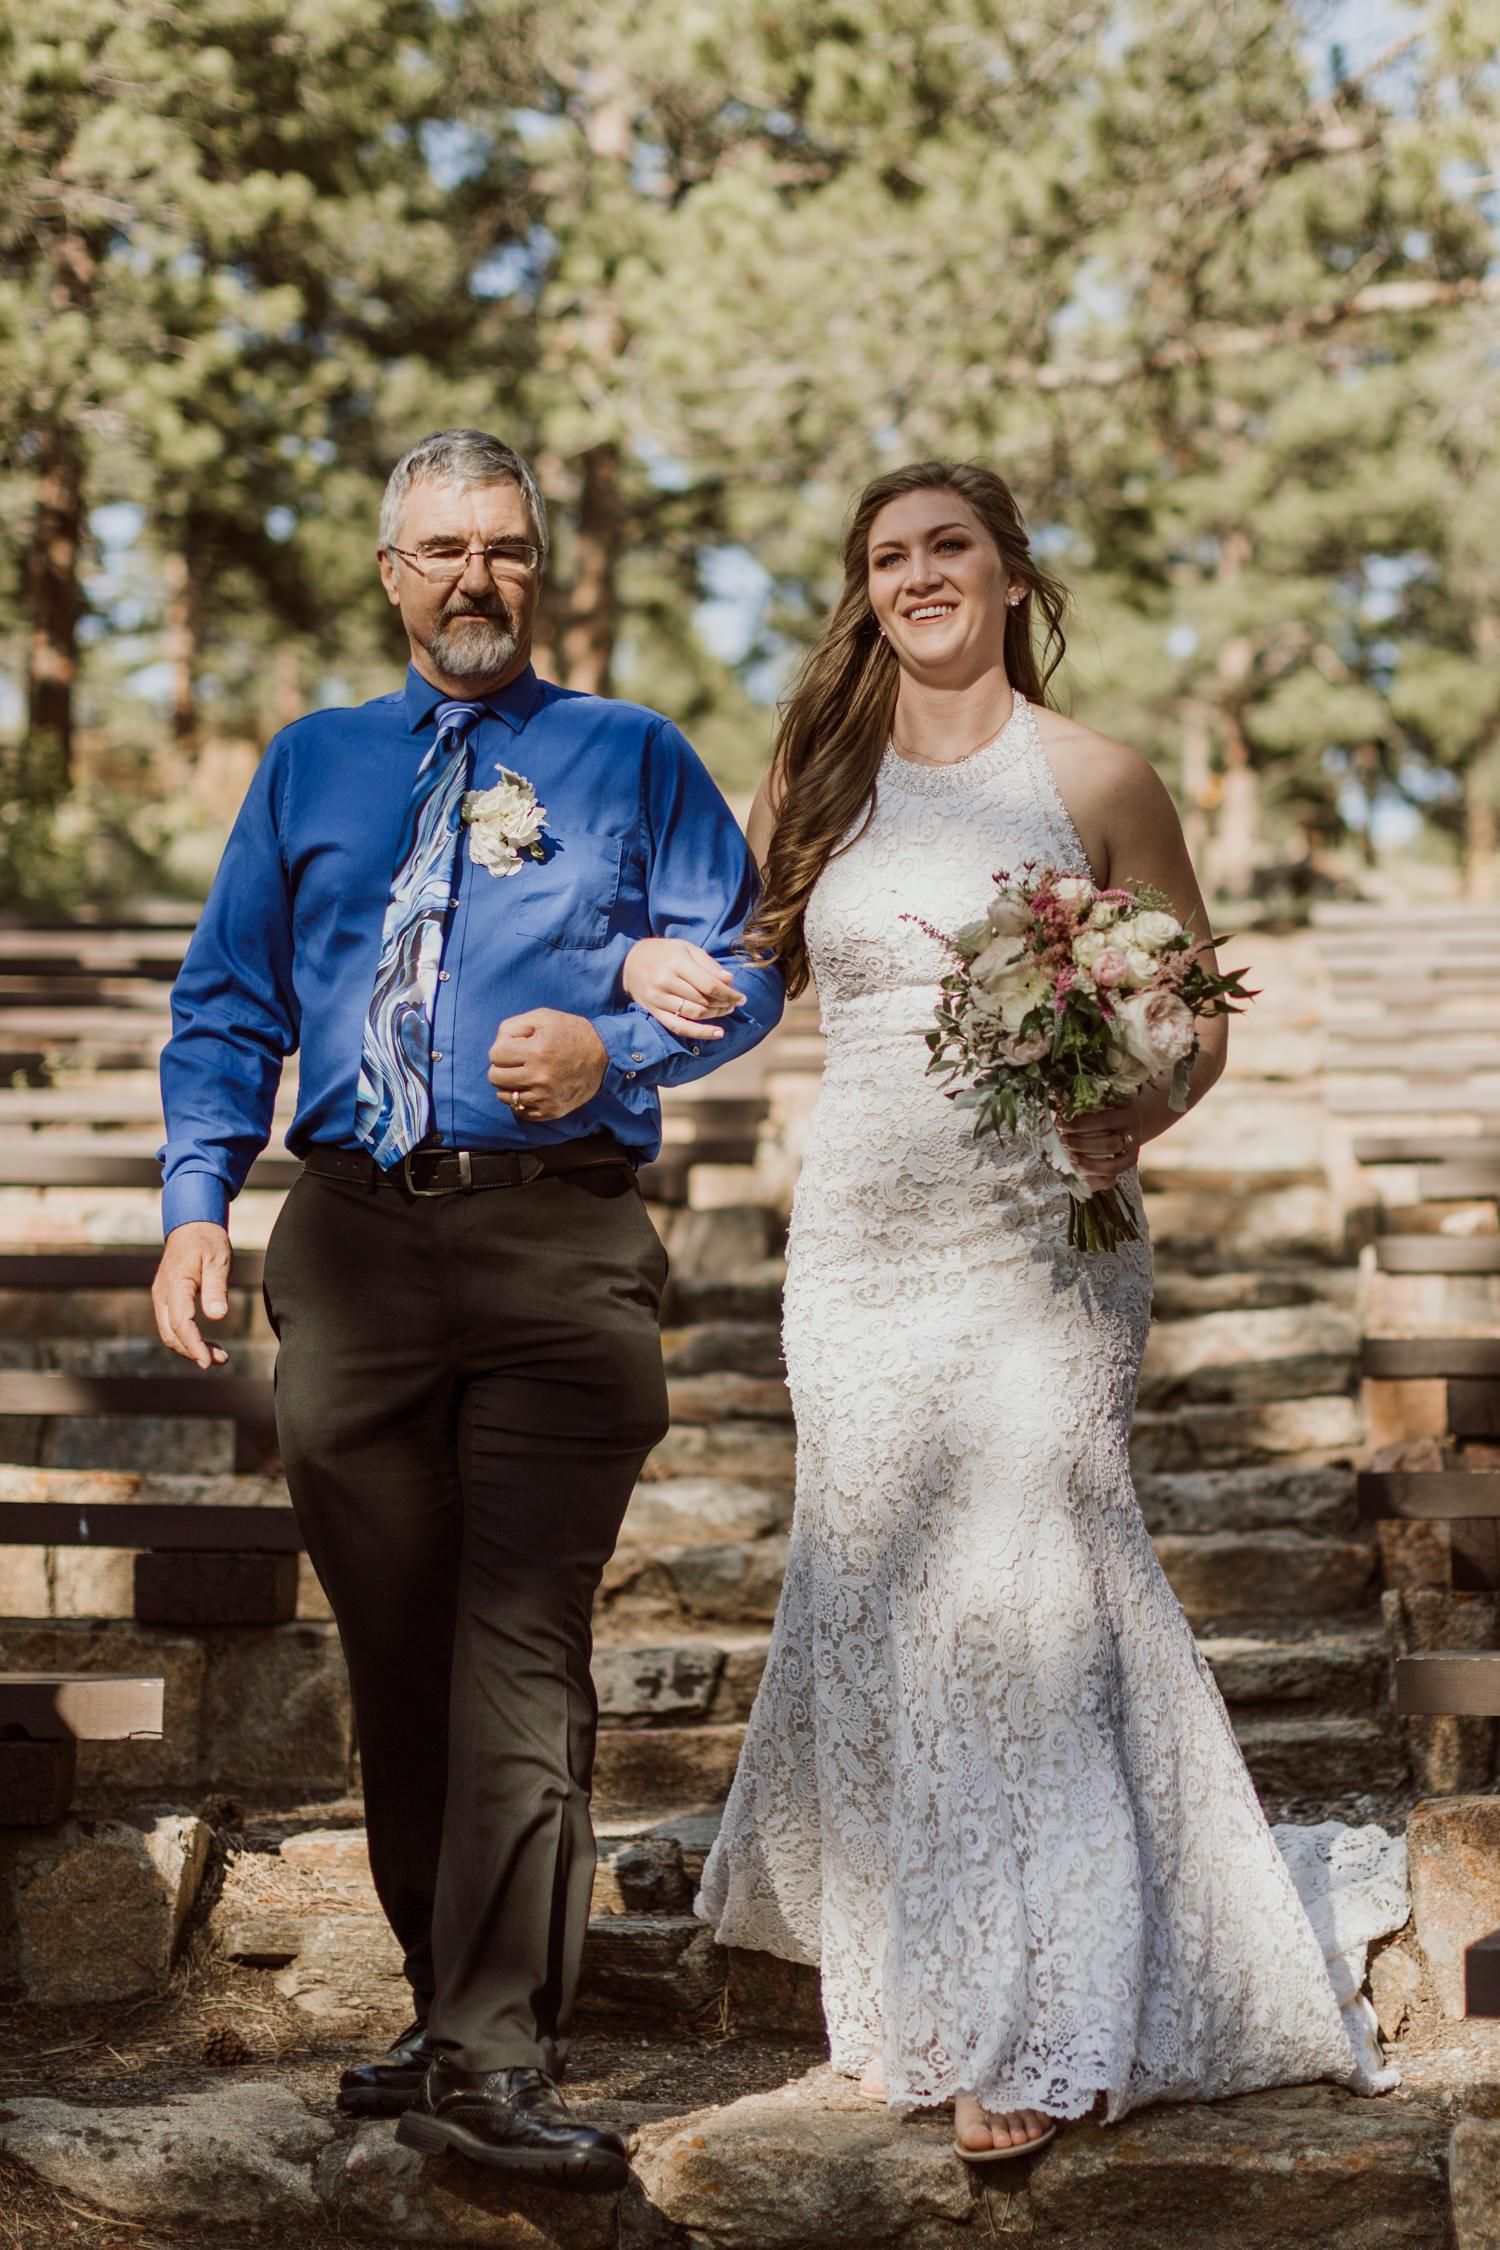 rocky-mountain-national-park-wedding-20.jpg